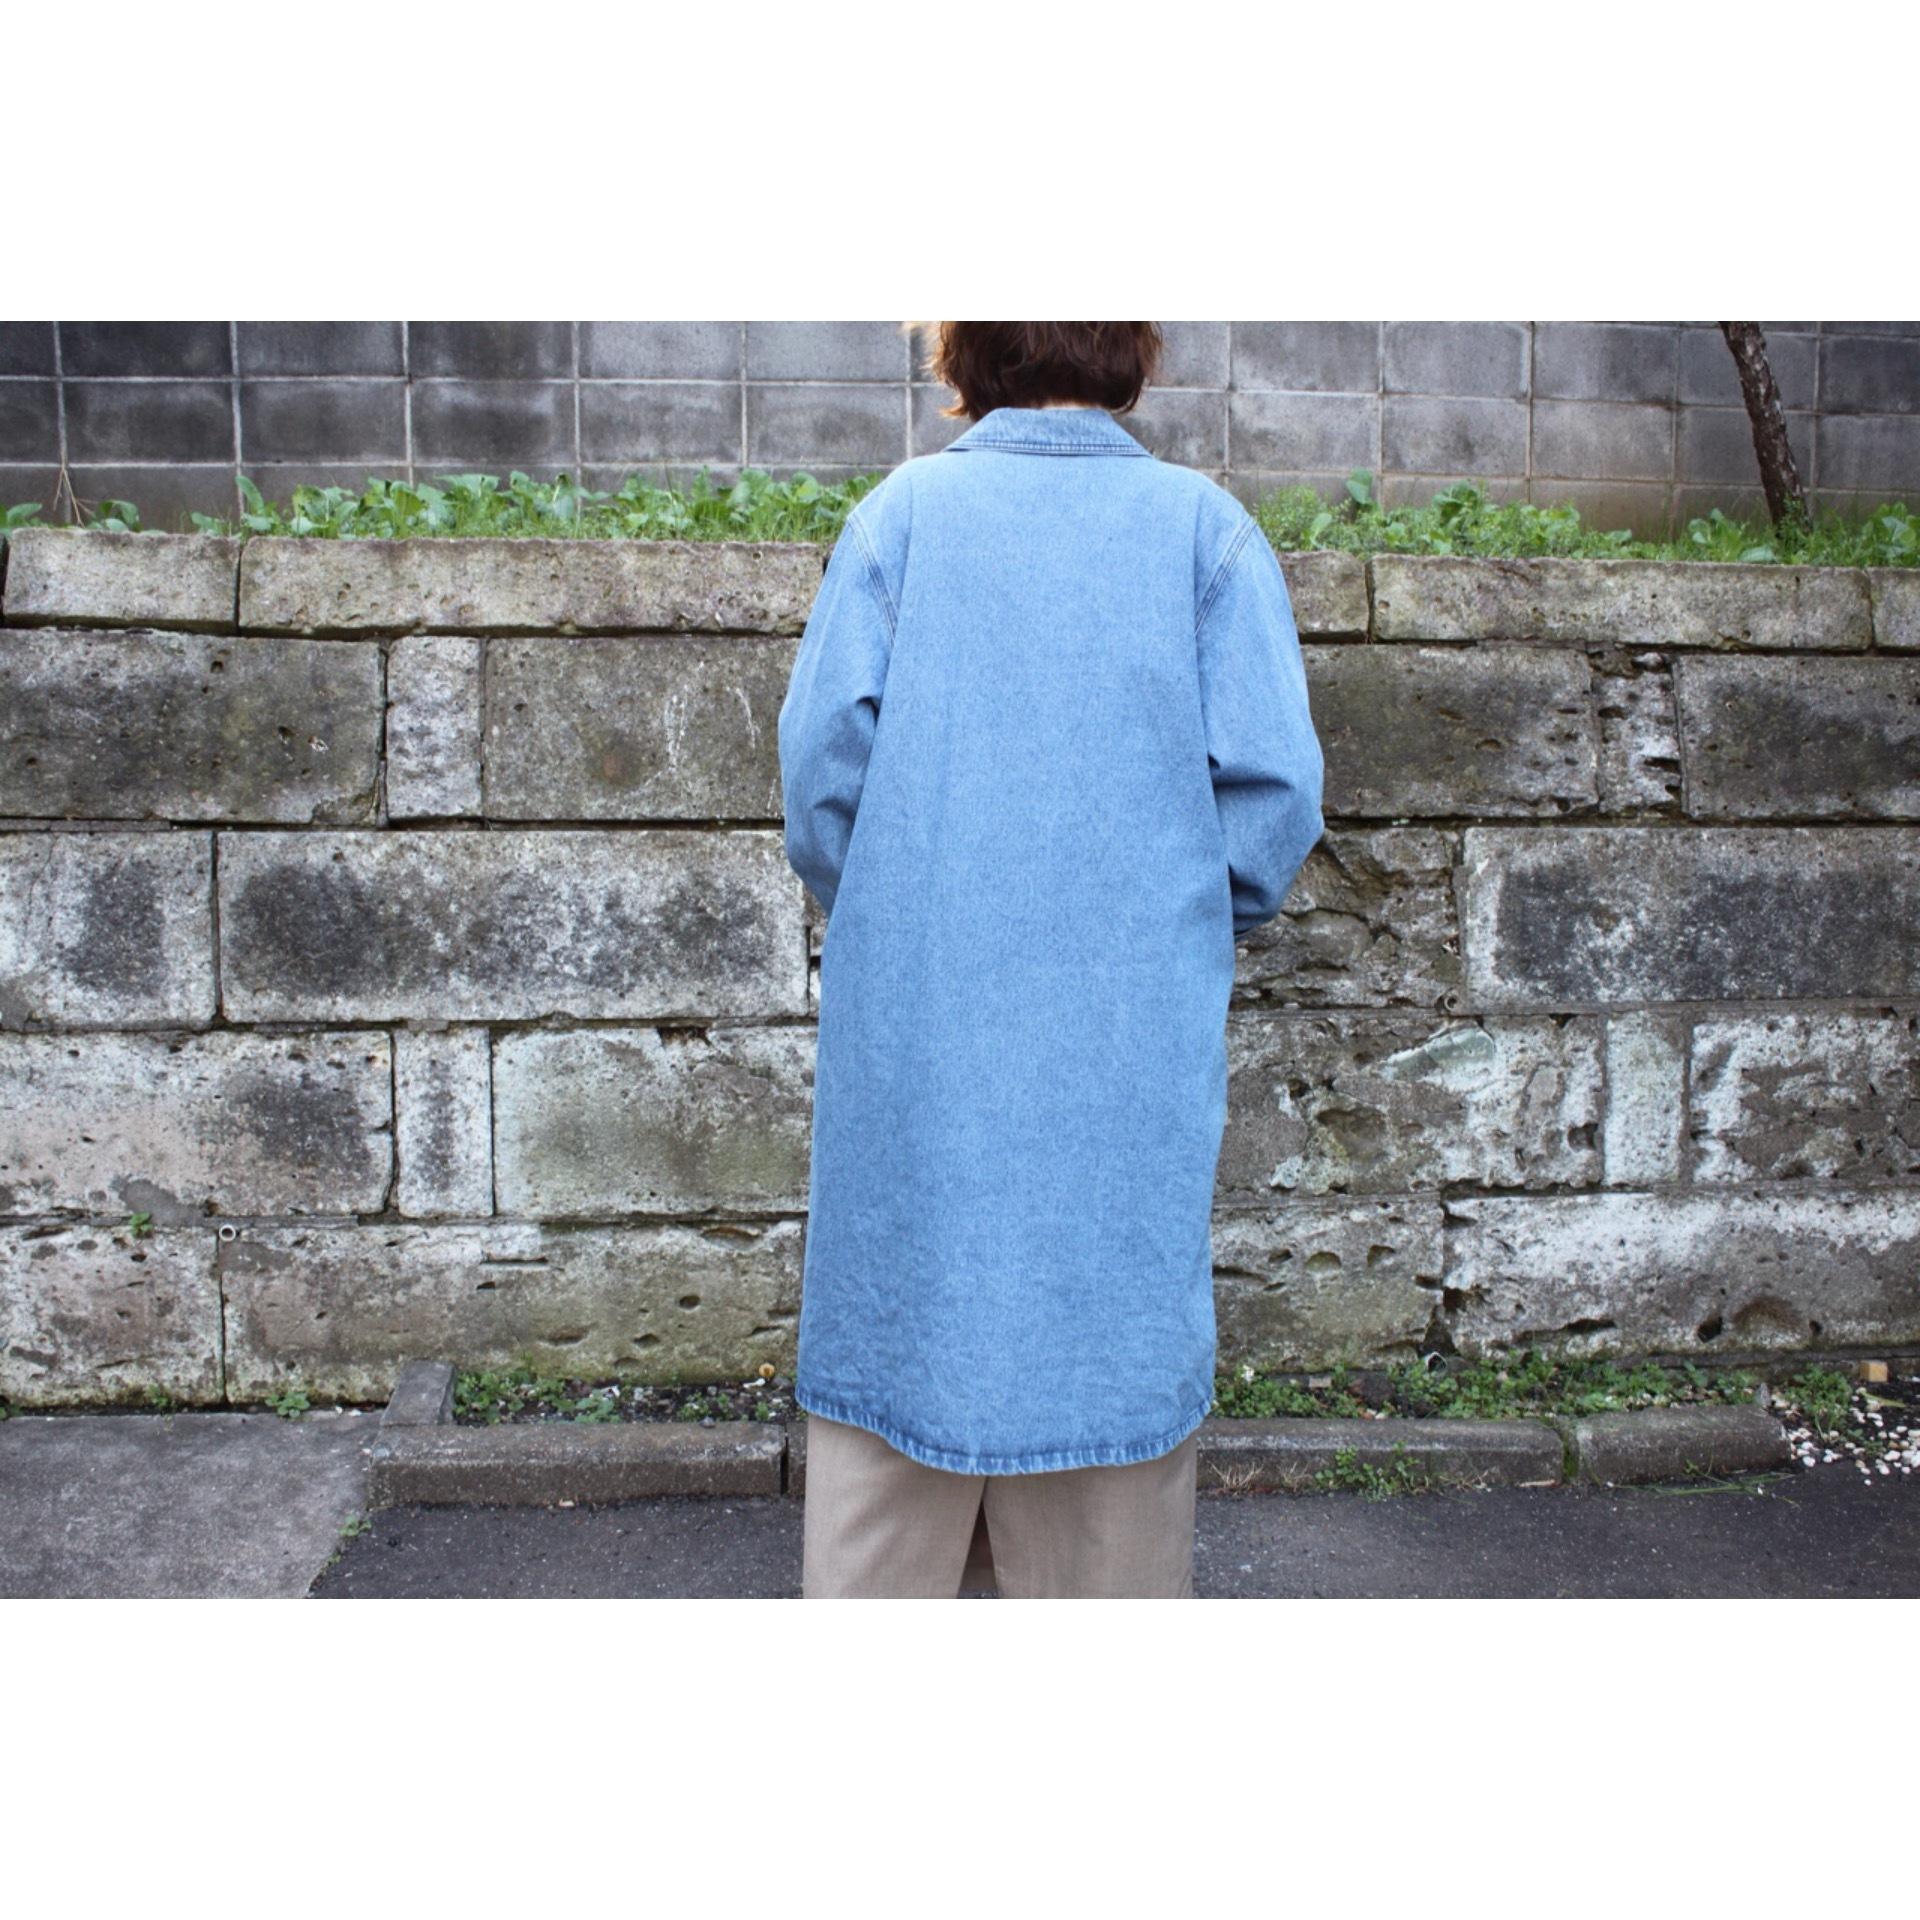 Vintage denim chester coat